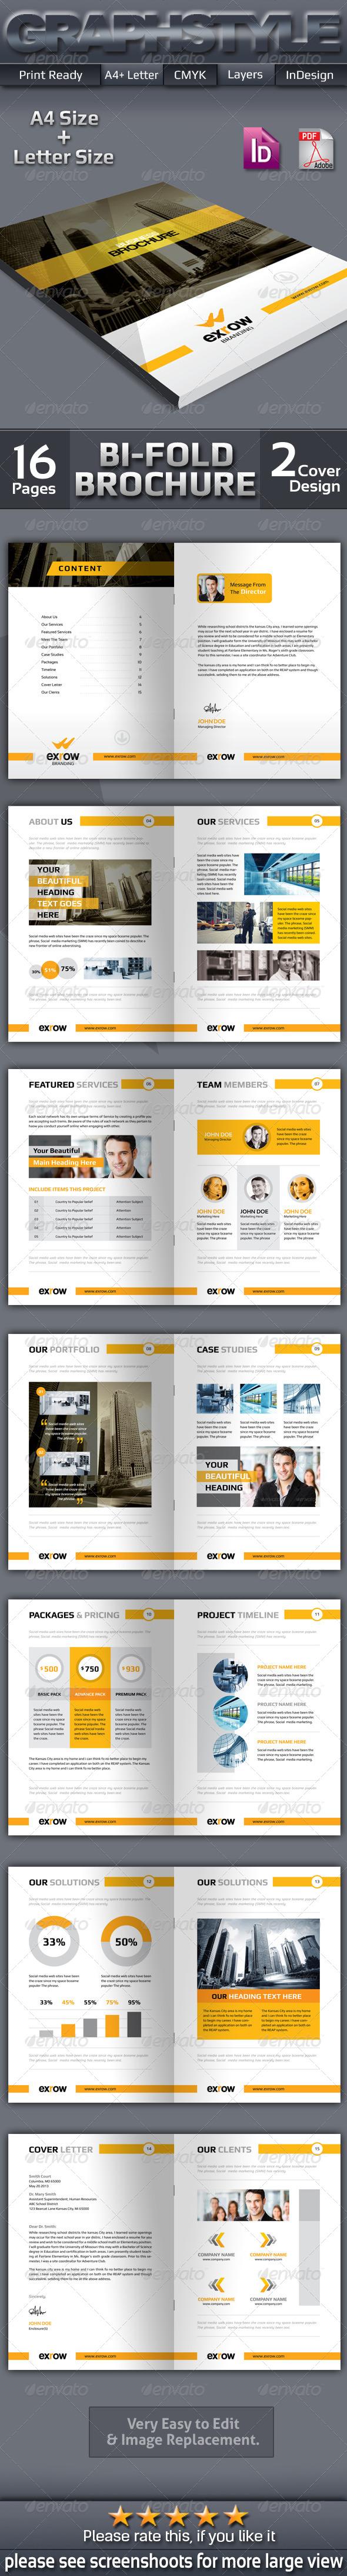 GraphicRiver Exrow Business Bi-Fold Brochure 7591883